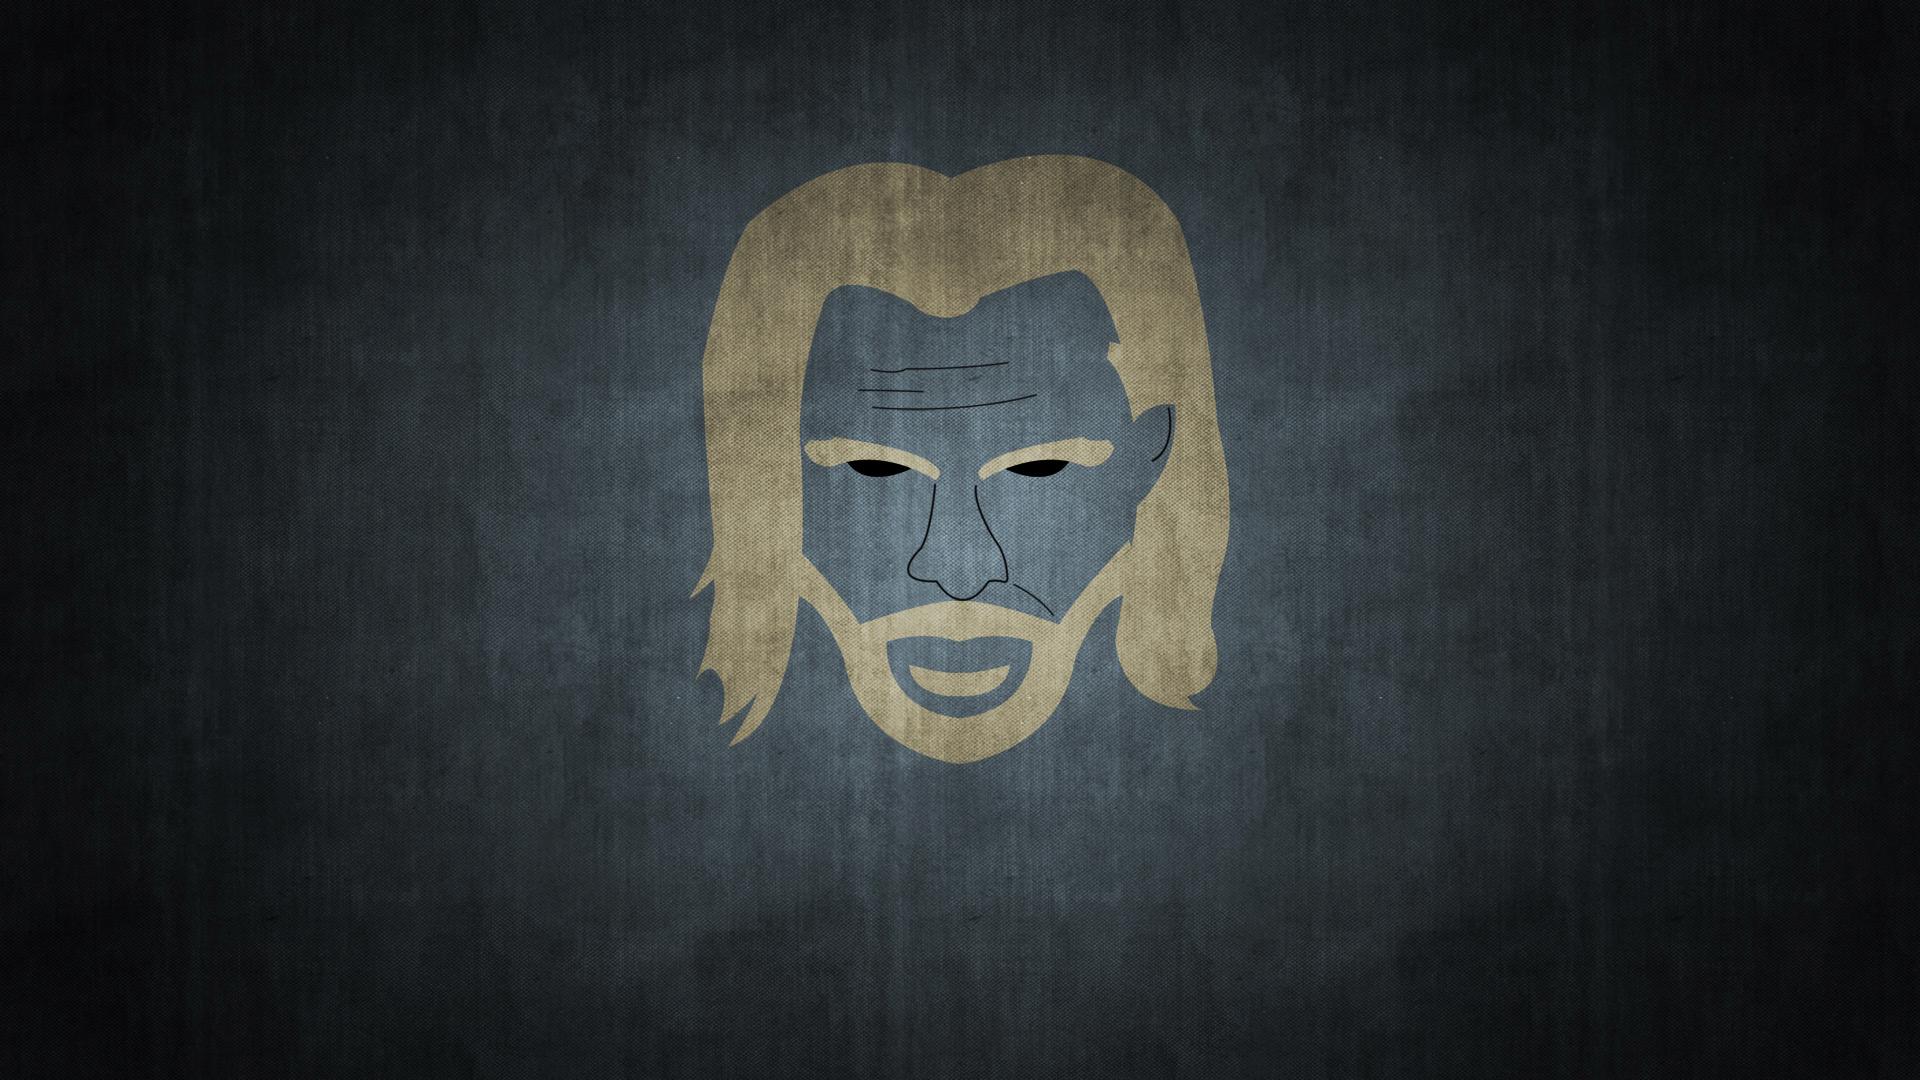 Free Thor Wallpaper HD for Desktop (21)